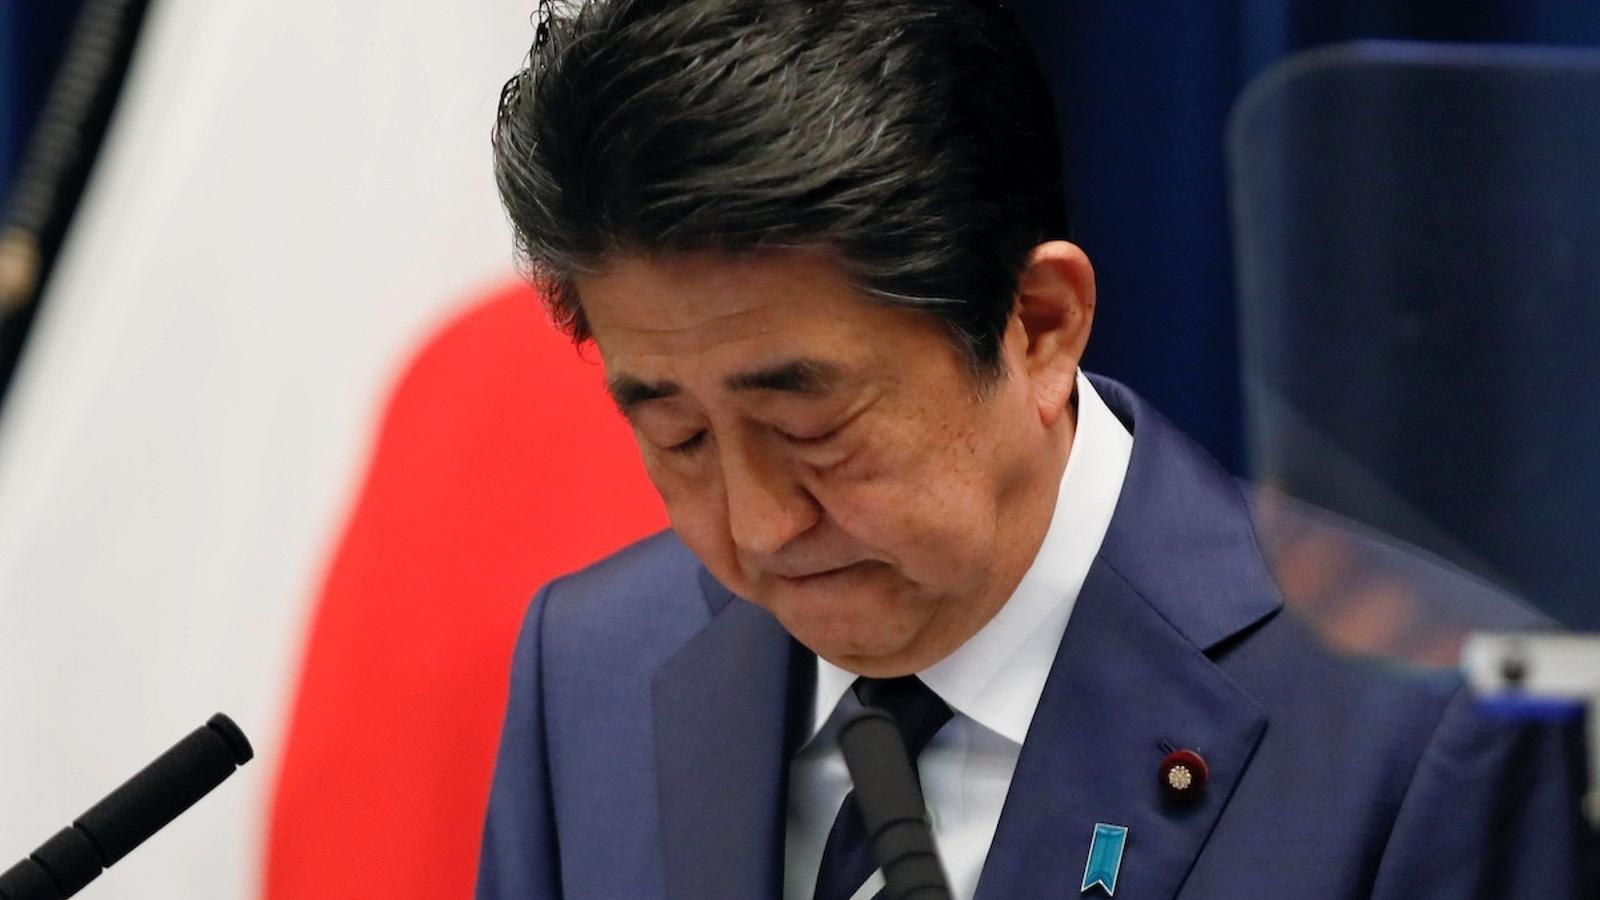 El primer ministre japonès, Shinzo Abe